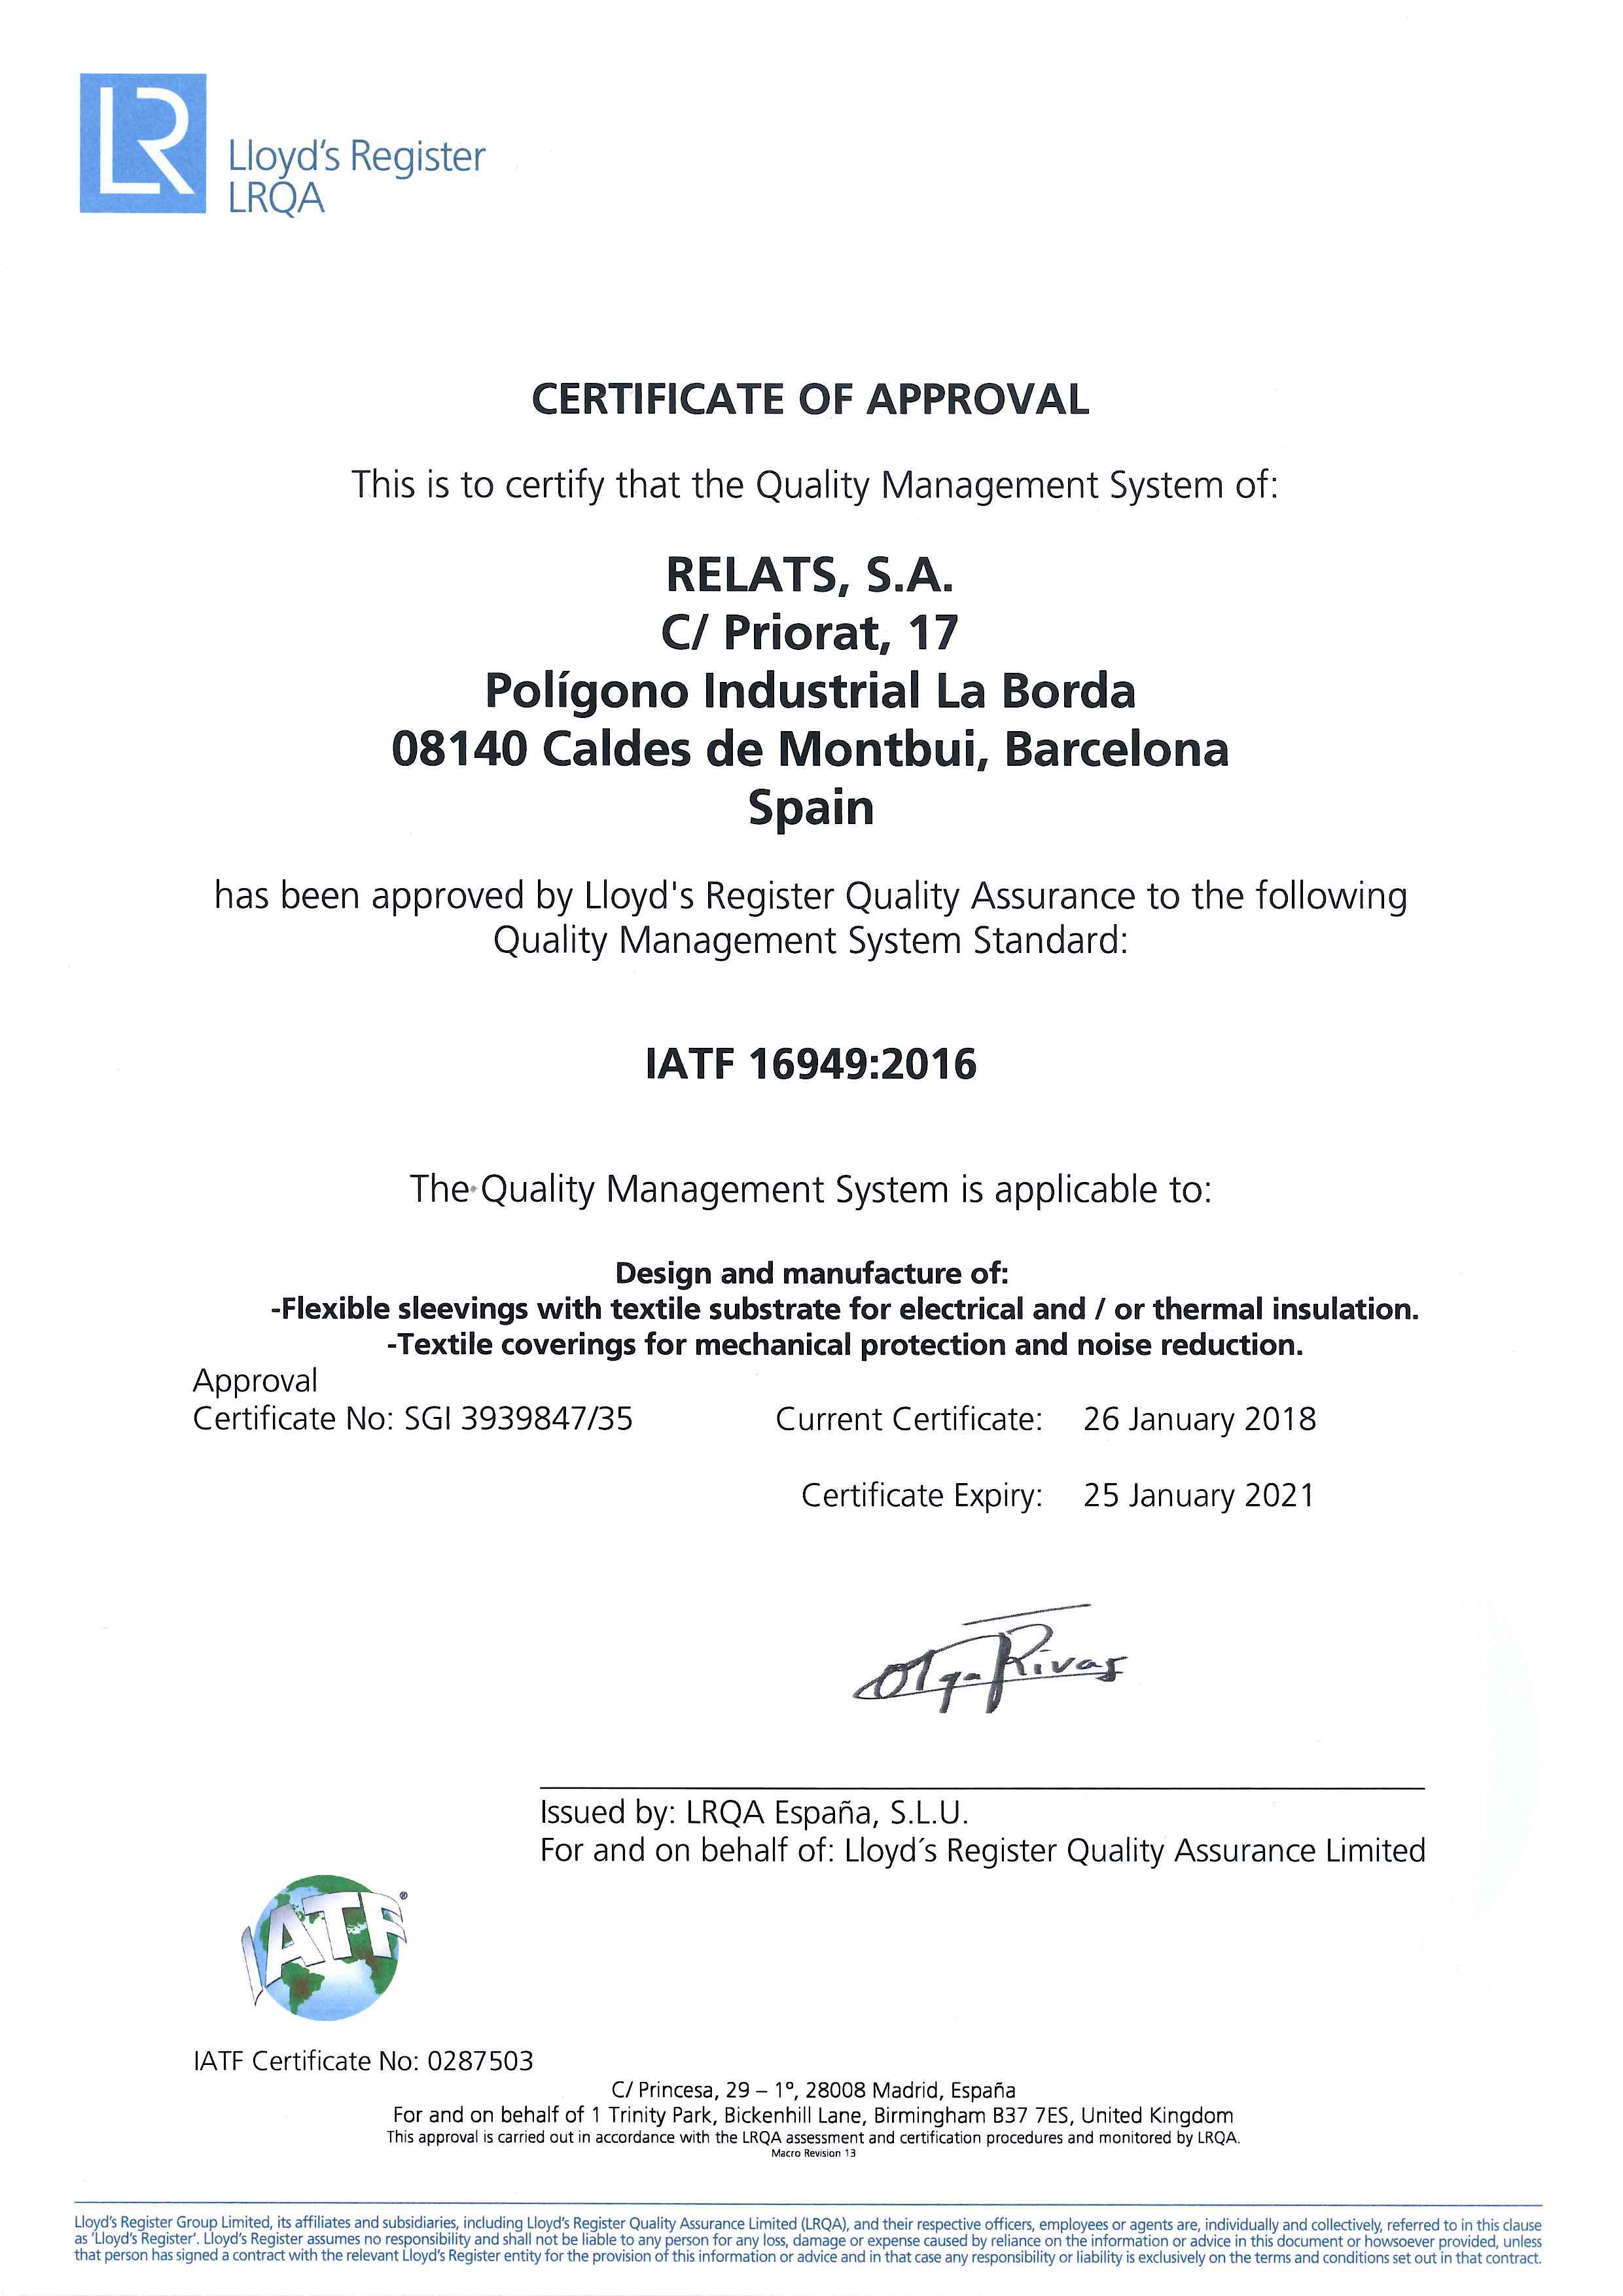 IATF 16949:2016 Zertifikat Relats Caldes de Montbui